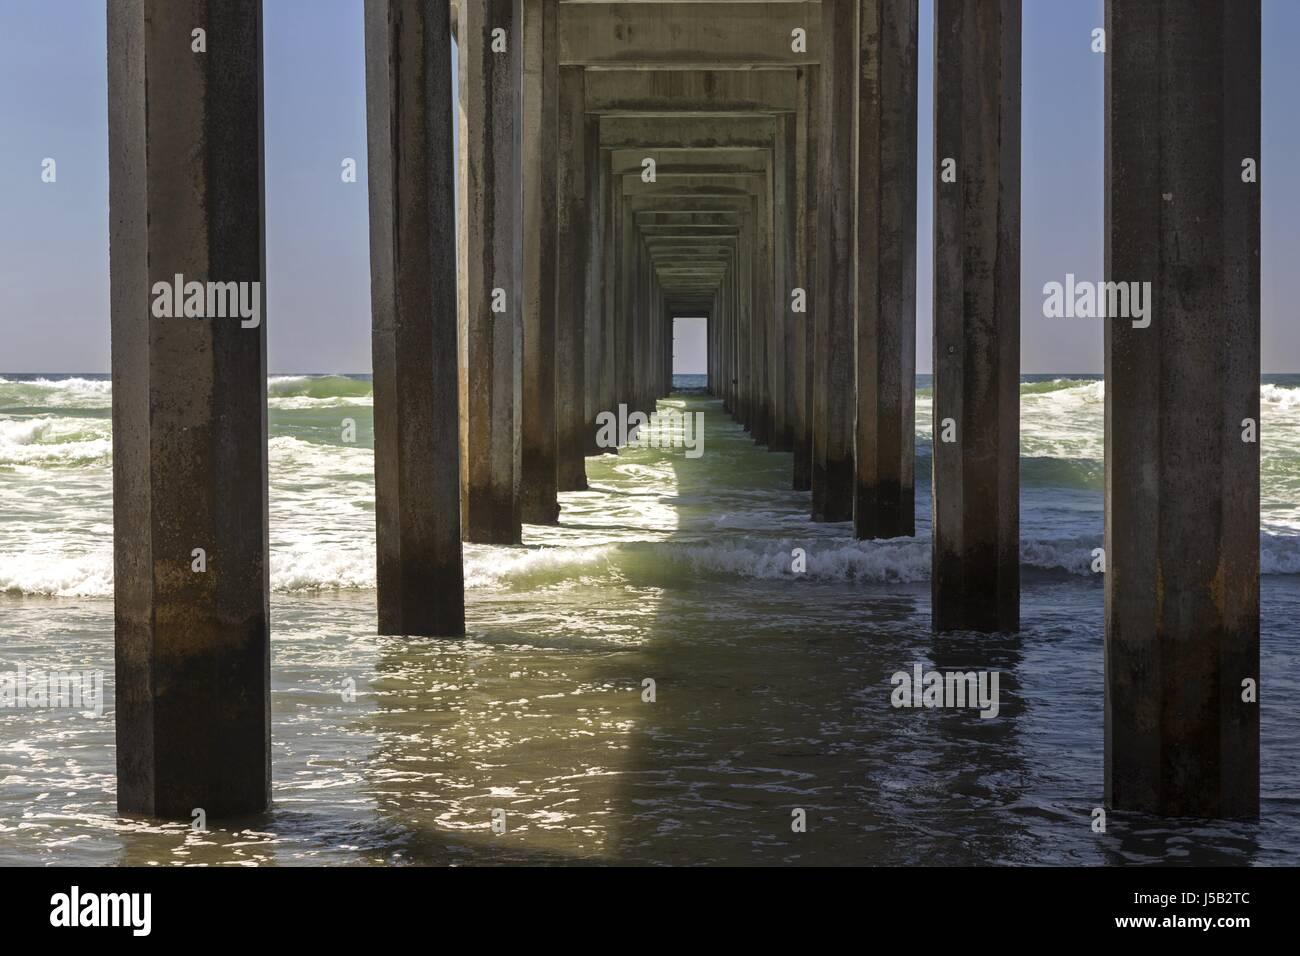 Symmetrical Geometric Pattern Scripps Pier La Jolla Shores San Diego California - Stock Image